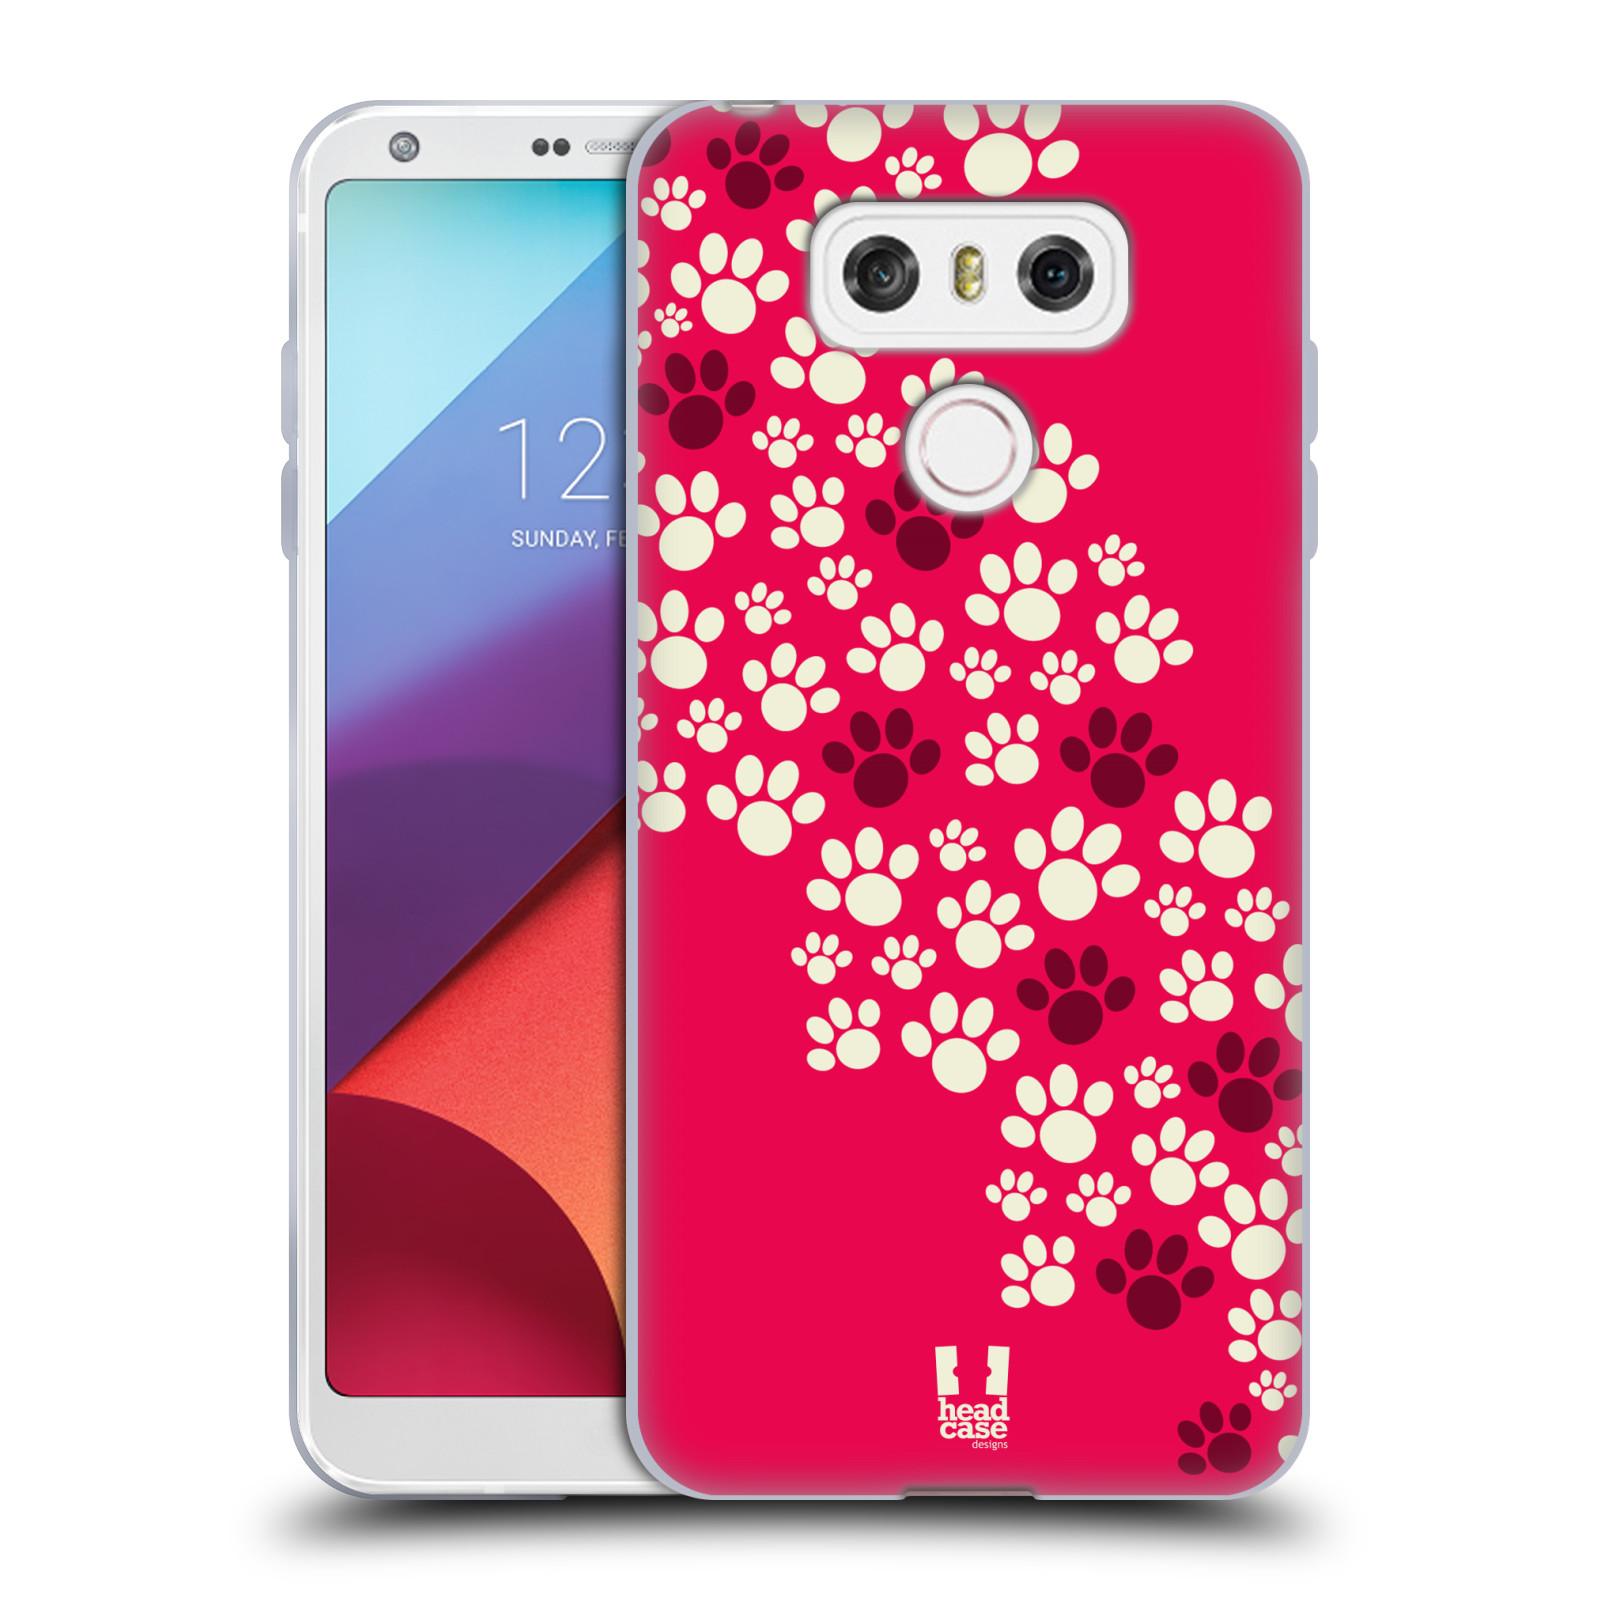 Silikonové pouzdro na mobil LG G6 - Head Case TLAPKY RŮŽOVÉ (Silikonový kryt či obal na mobilní telefon LG G6 H870 / LG G6 Dual SIM H870DS)